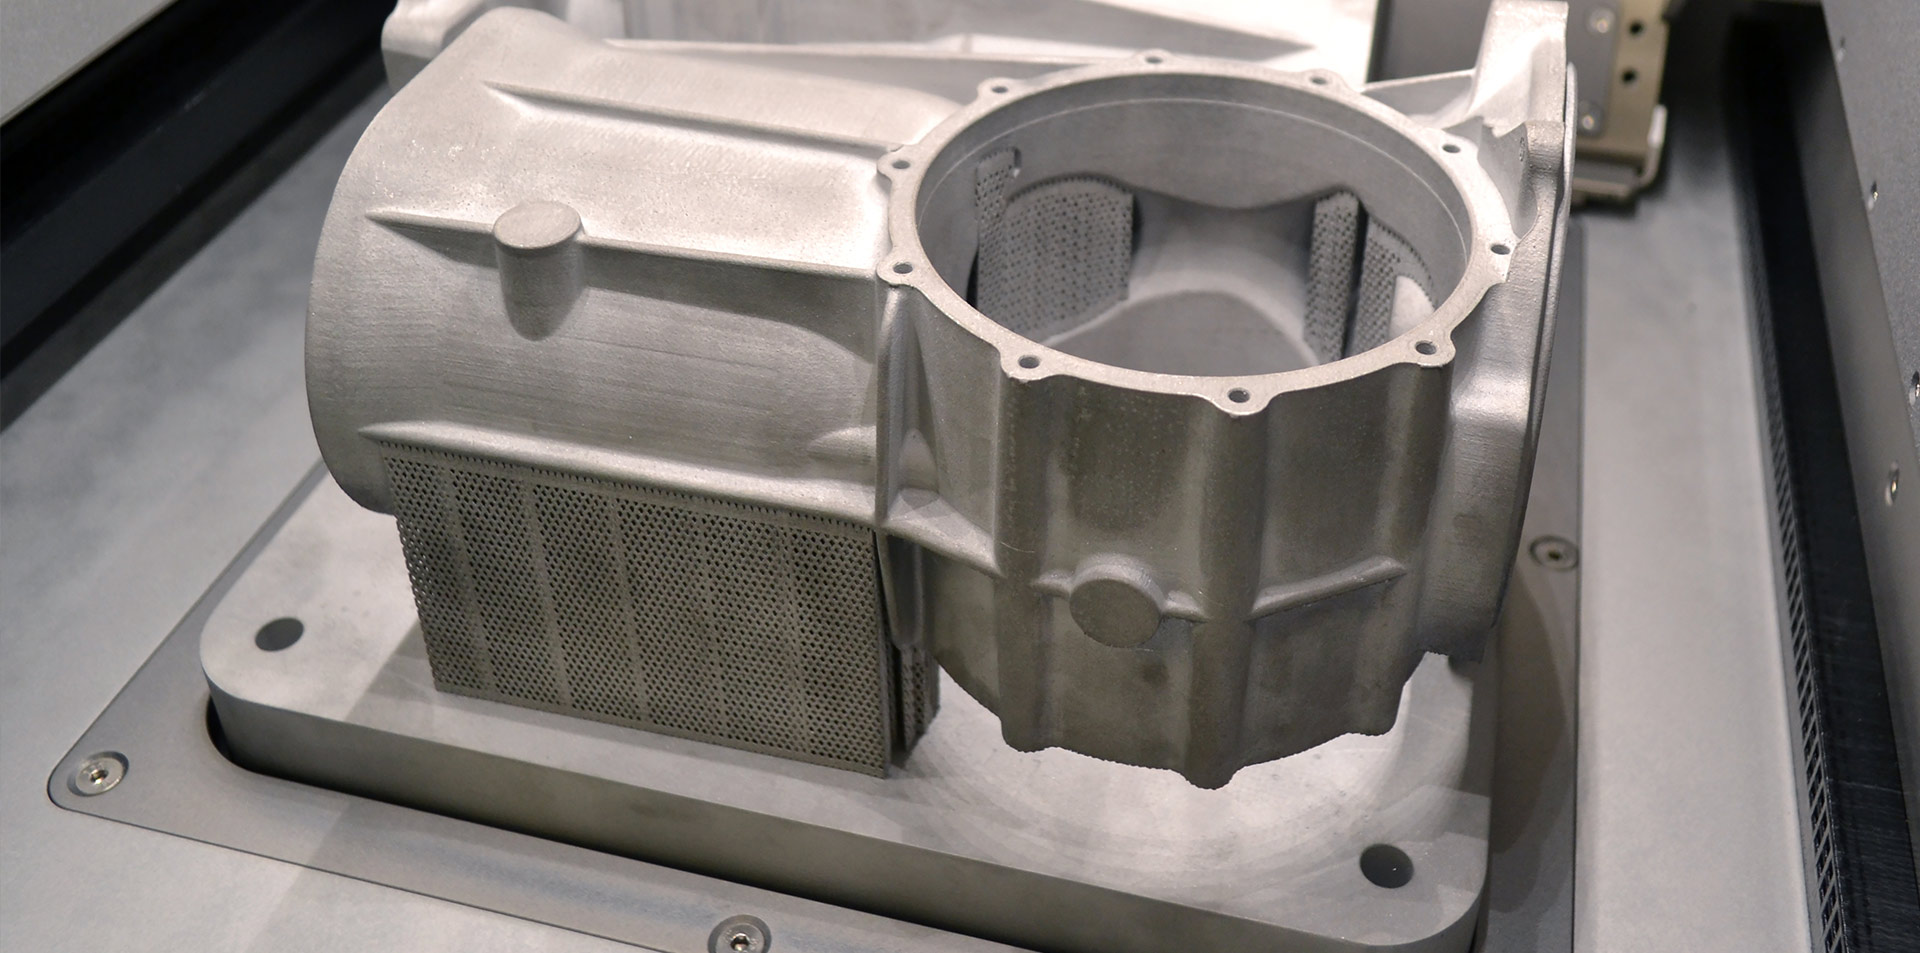 3D-printed spare part in metal